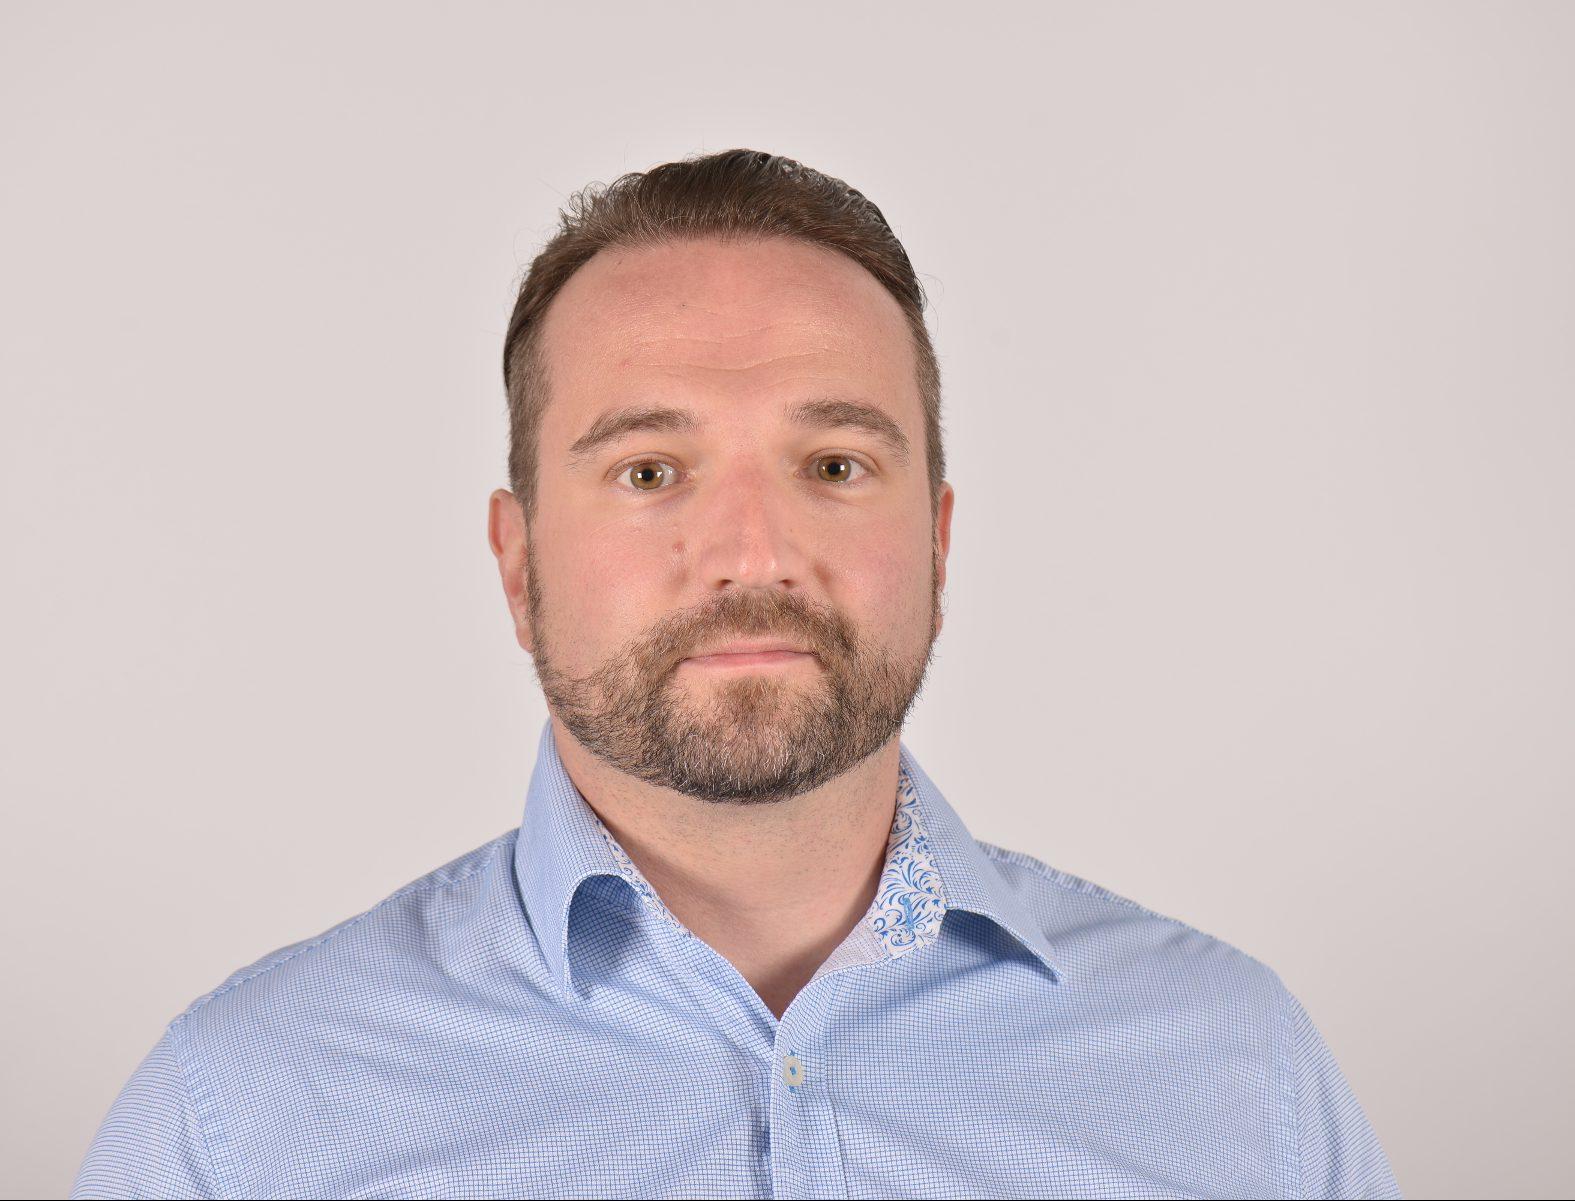 Jari Inget, Director Connectivity Solutions bei Bittium